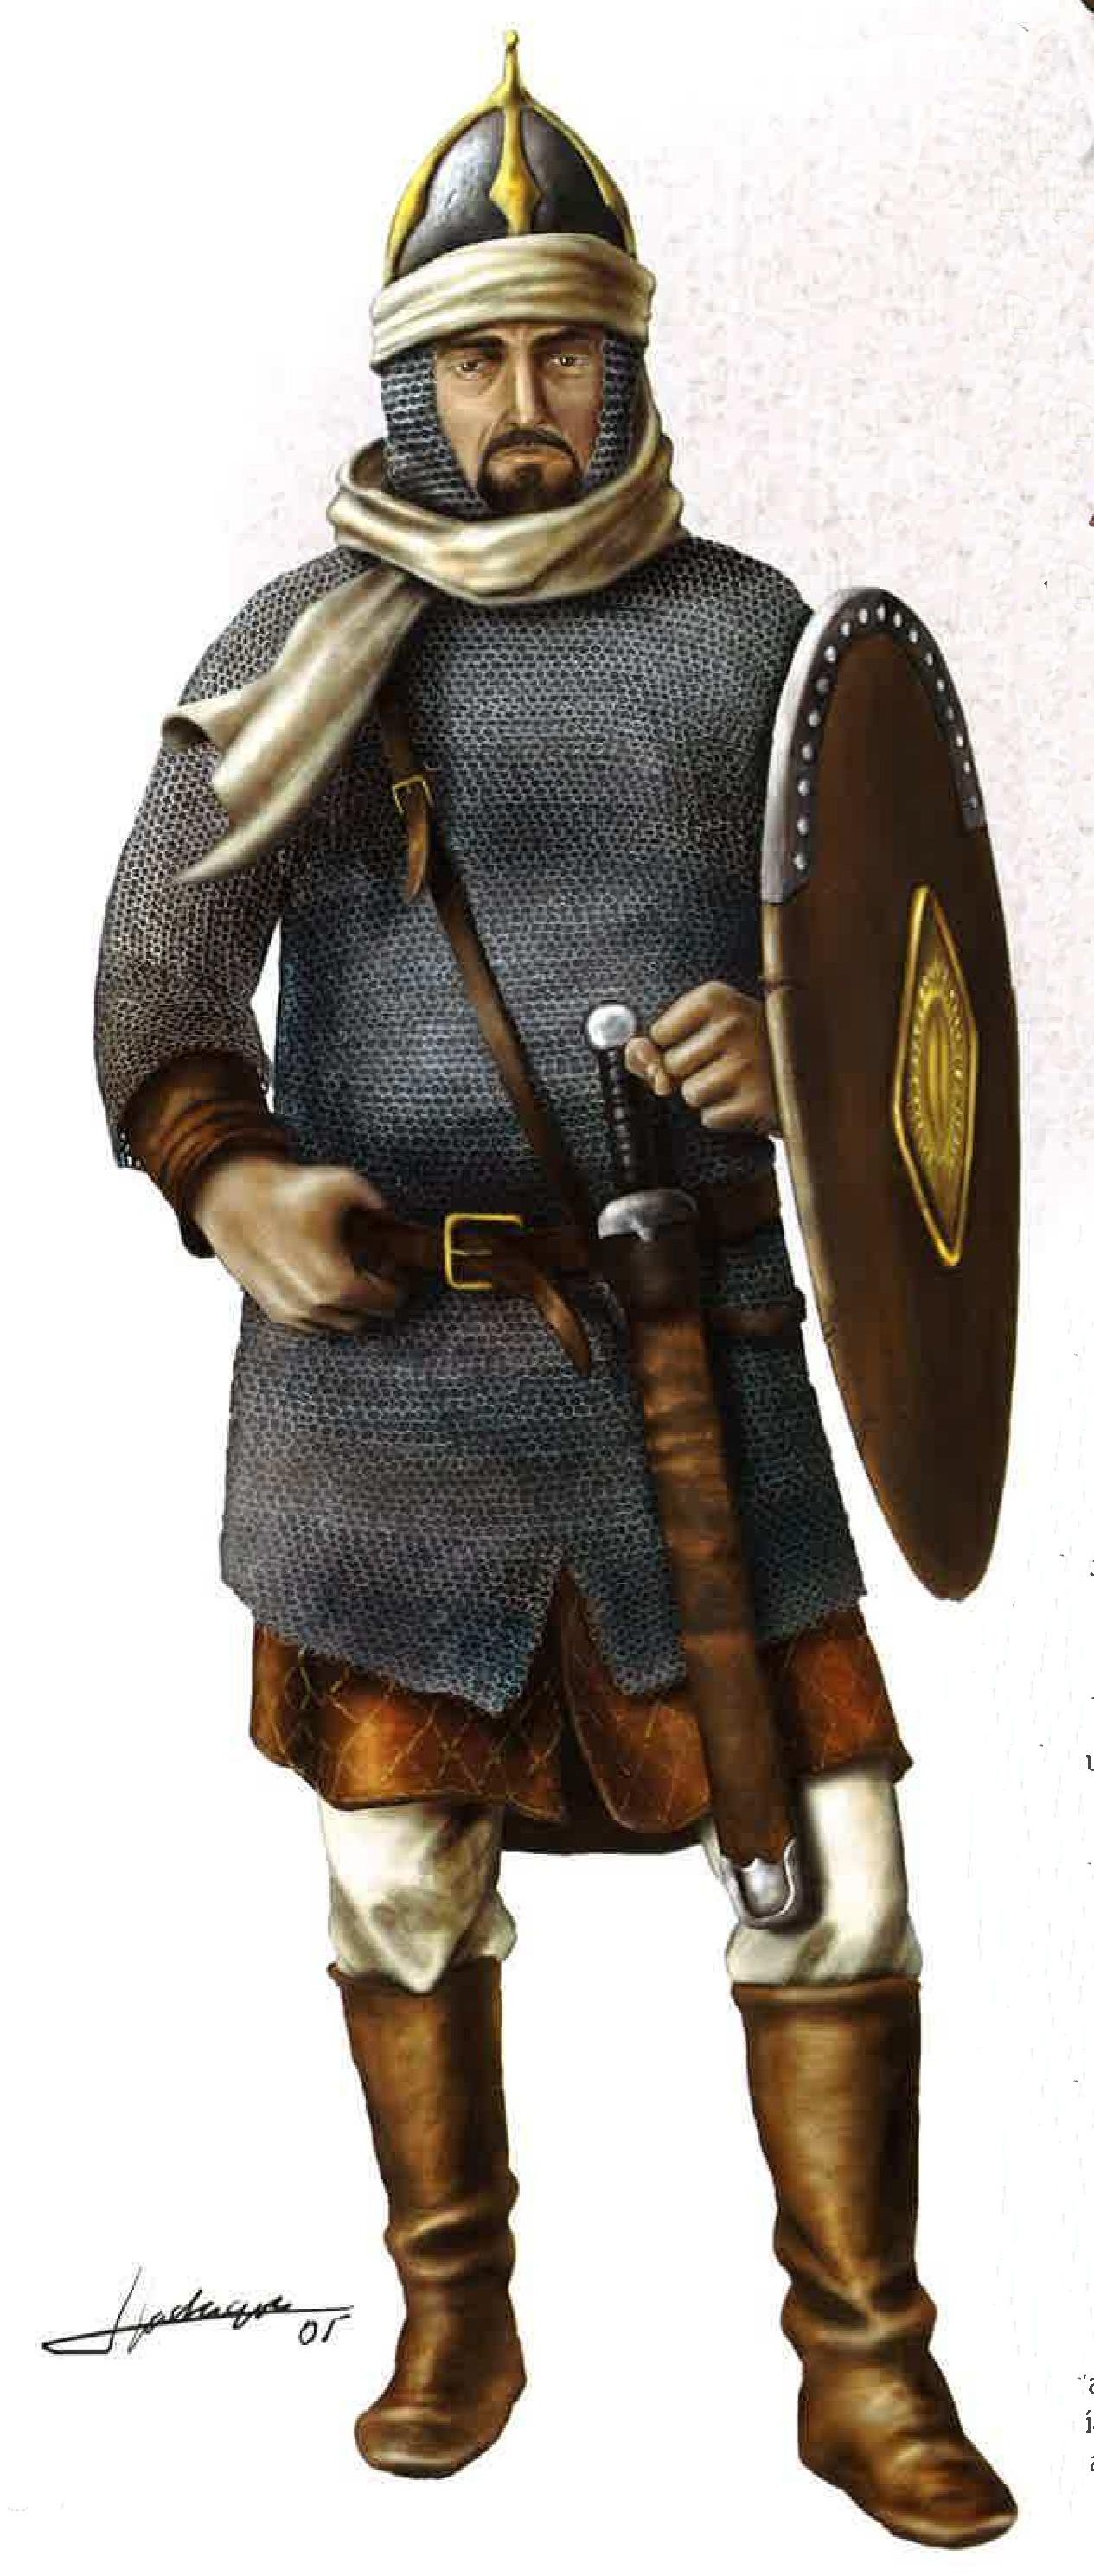 Un guerrero andalusí de la época taifa O9VzLB